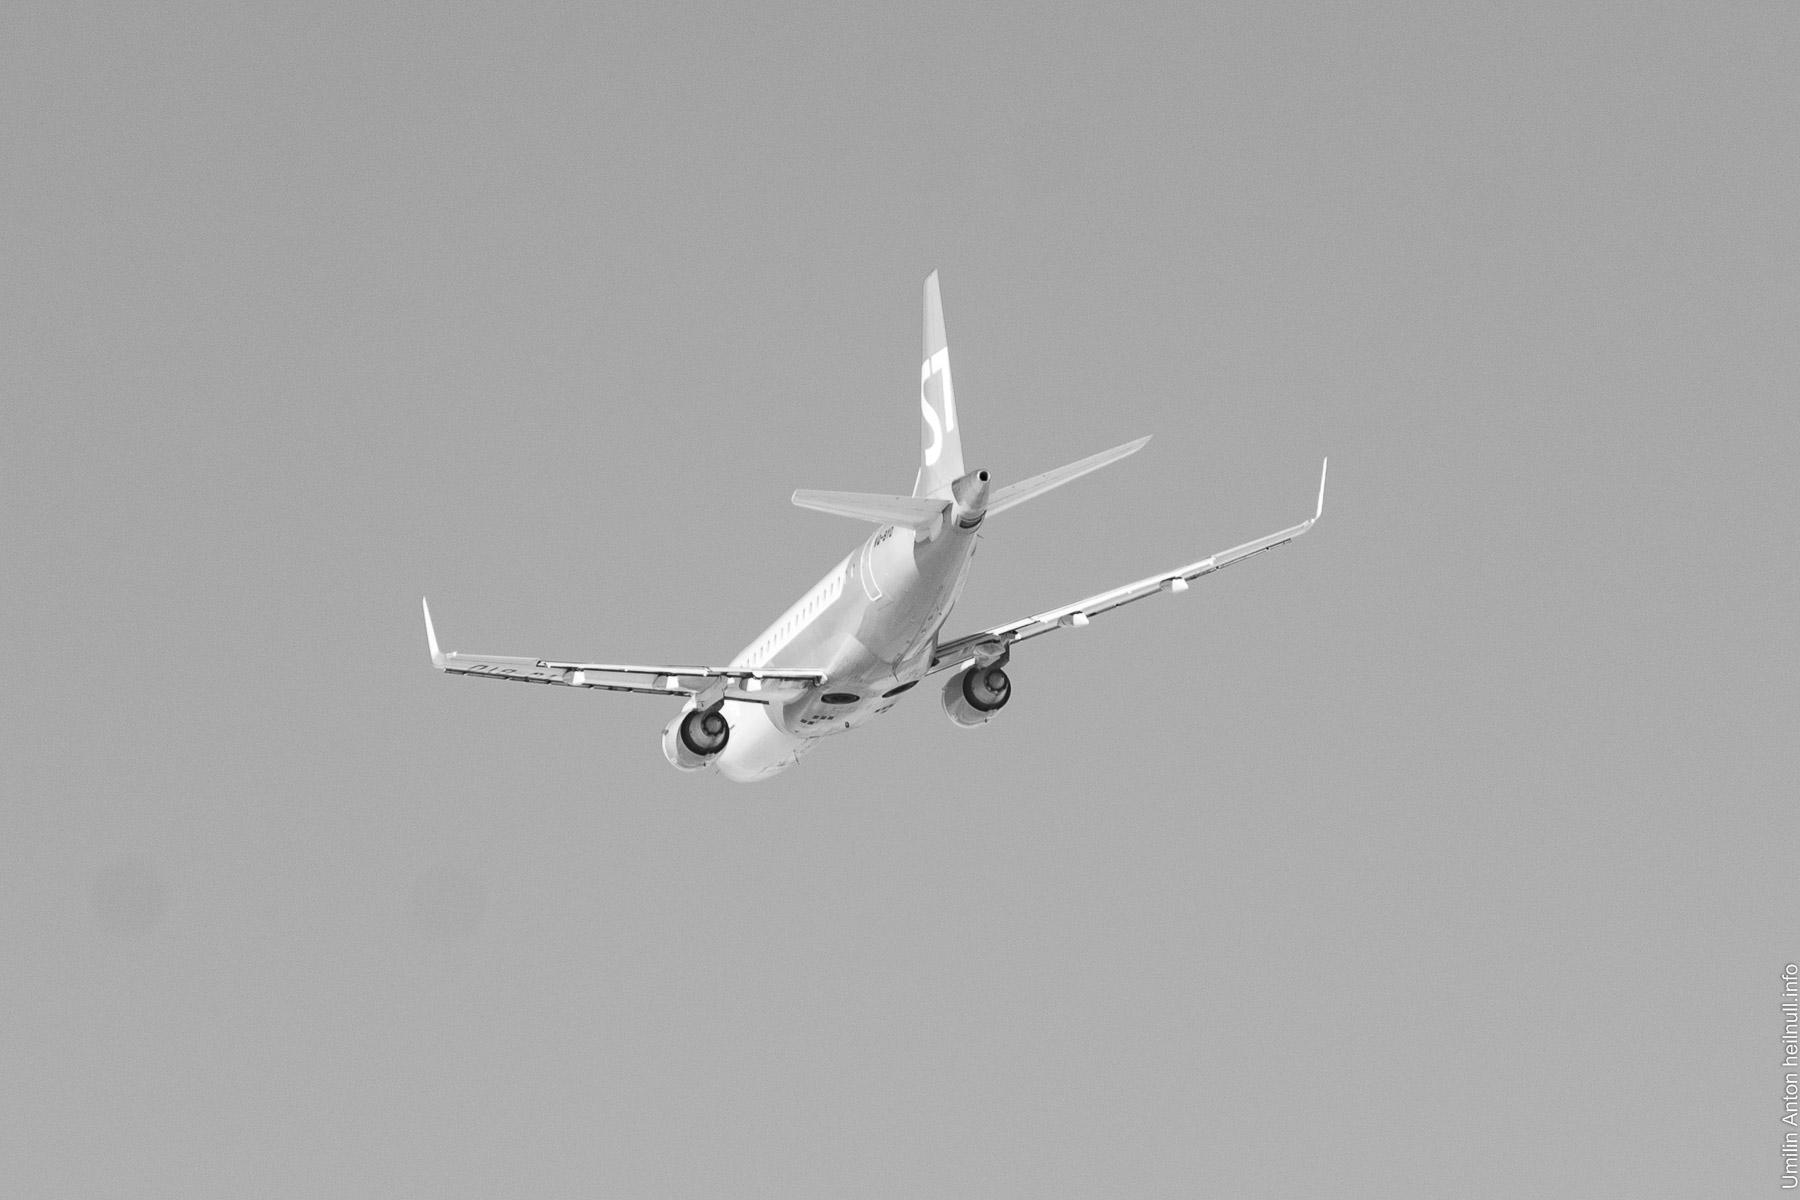 UAY_8753-17